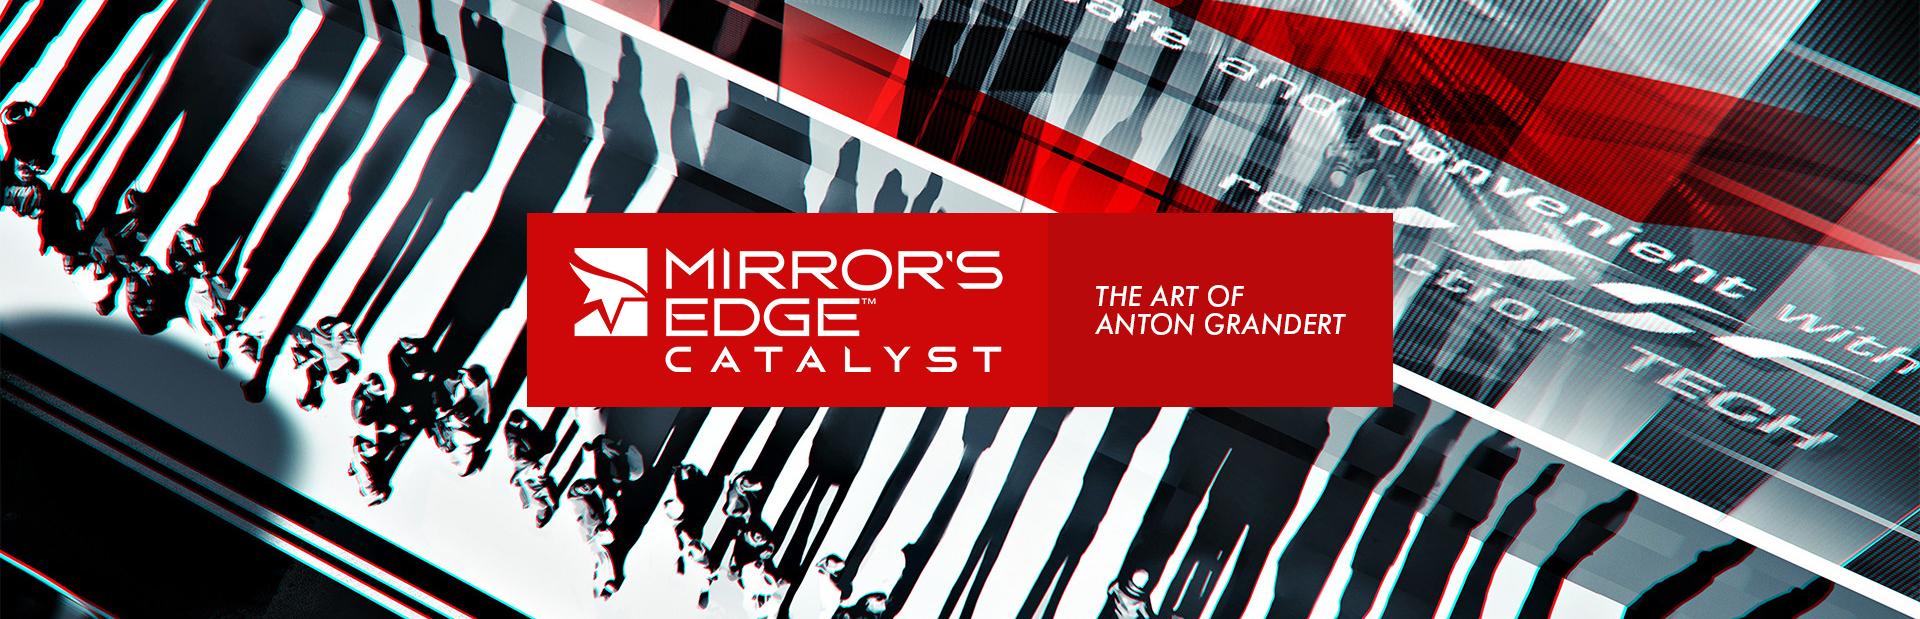 The Art of Mirror's Edge Catalyst by Anton Grandert